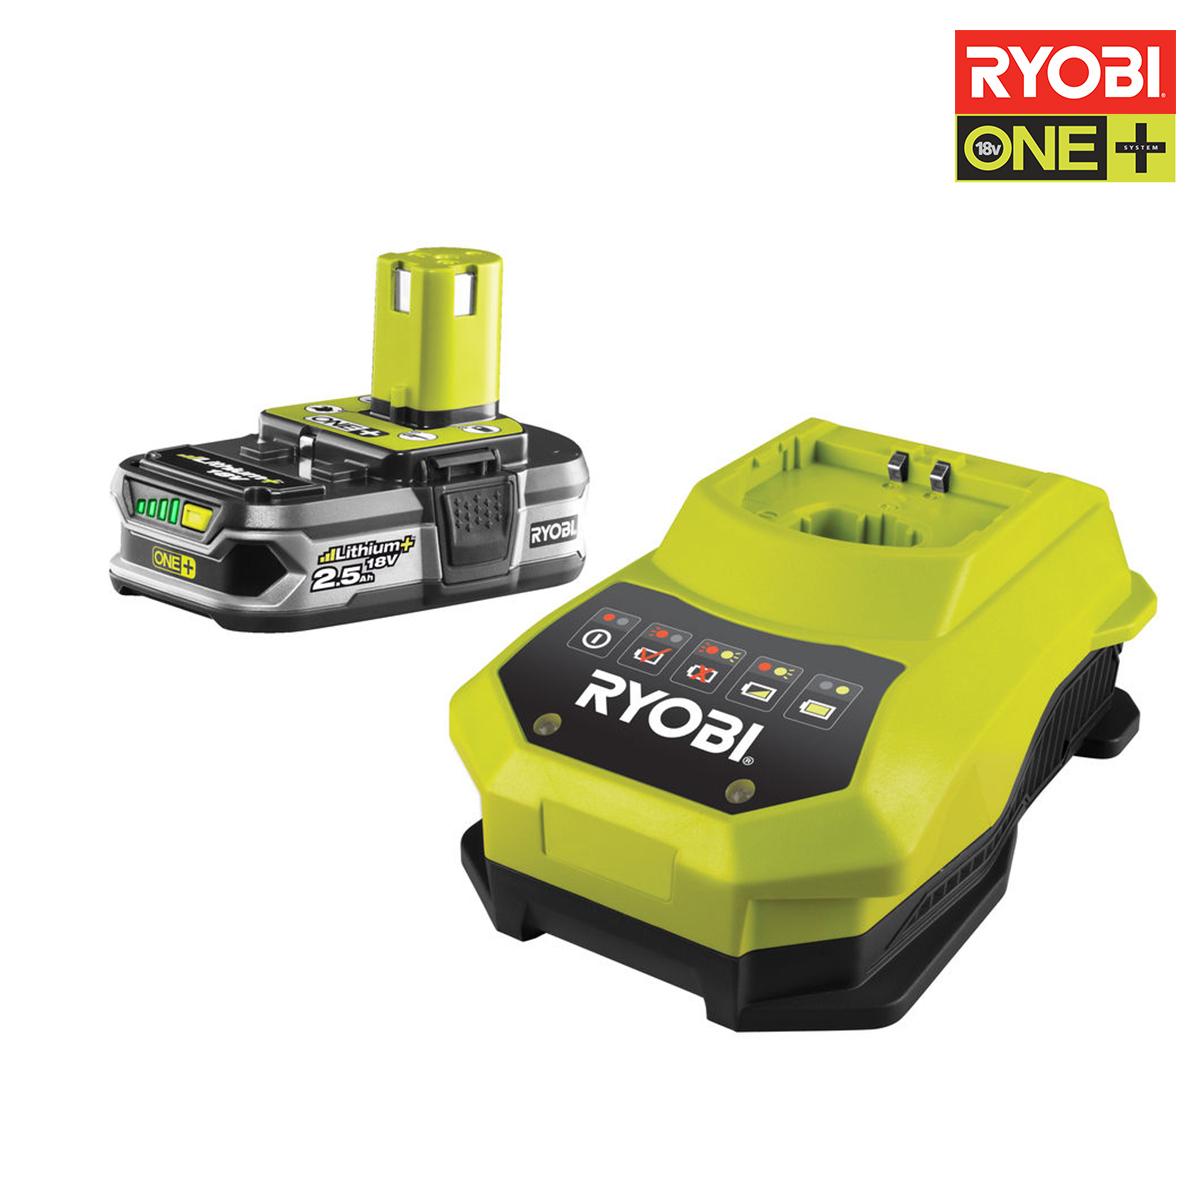 ryobi pack batterie 18v oneplus 2 5ah et chargeur rapide 1 8ah lithium ion rbc18l25. Black Bedroom Furniture Sets. Home Design Ideas